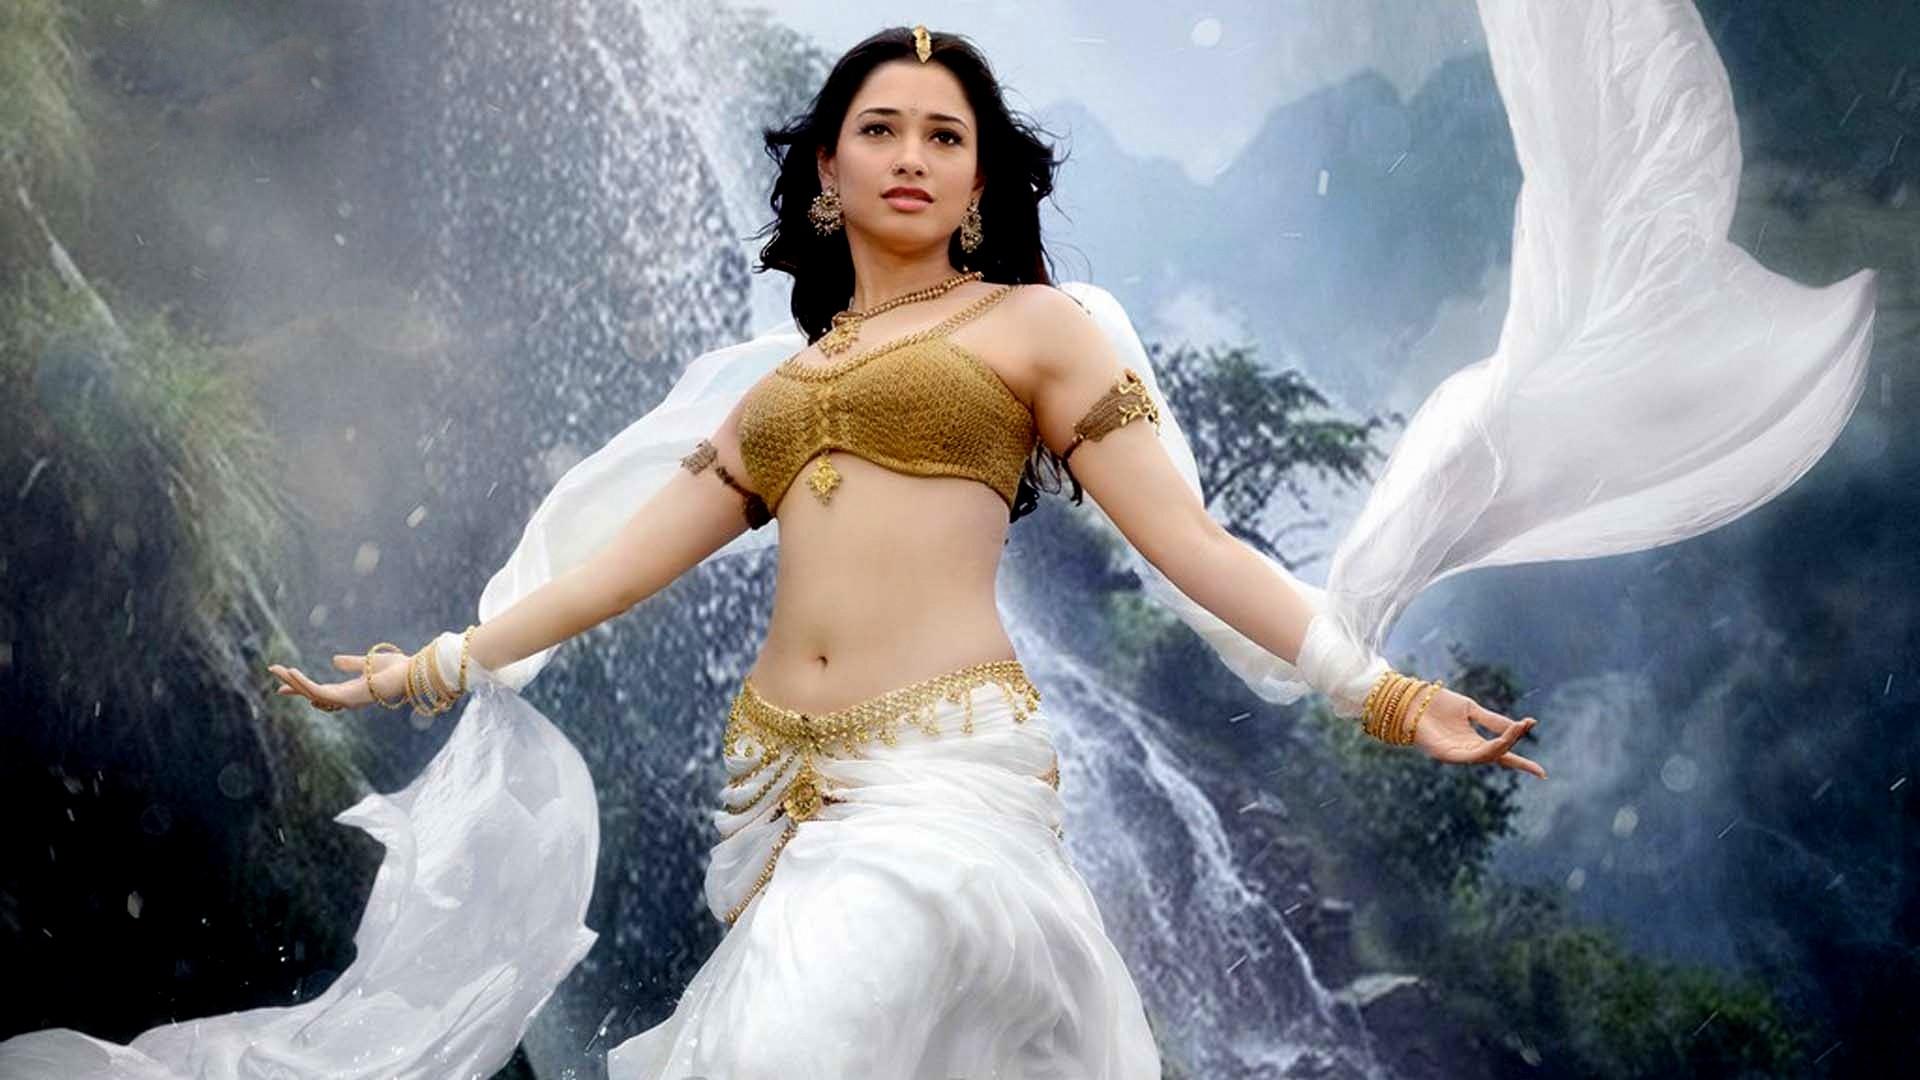 Tamanna-Bhatia-in-Bahubali-Movie-Hd-Images